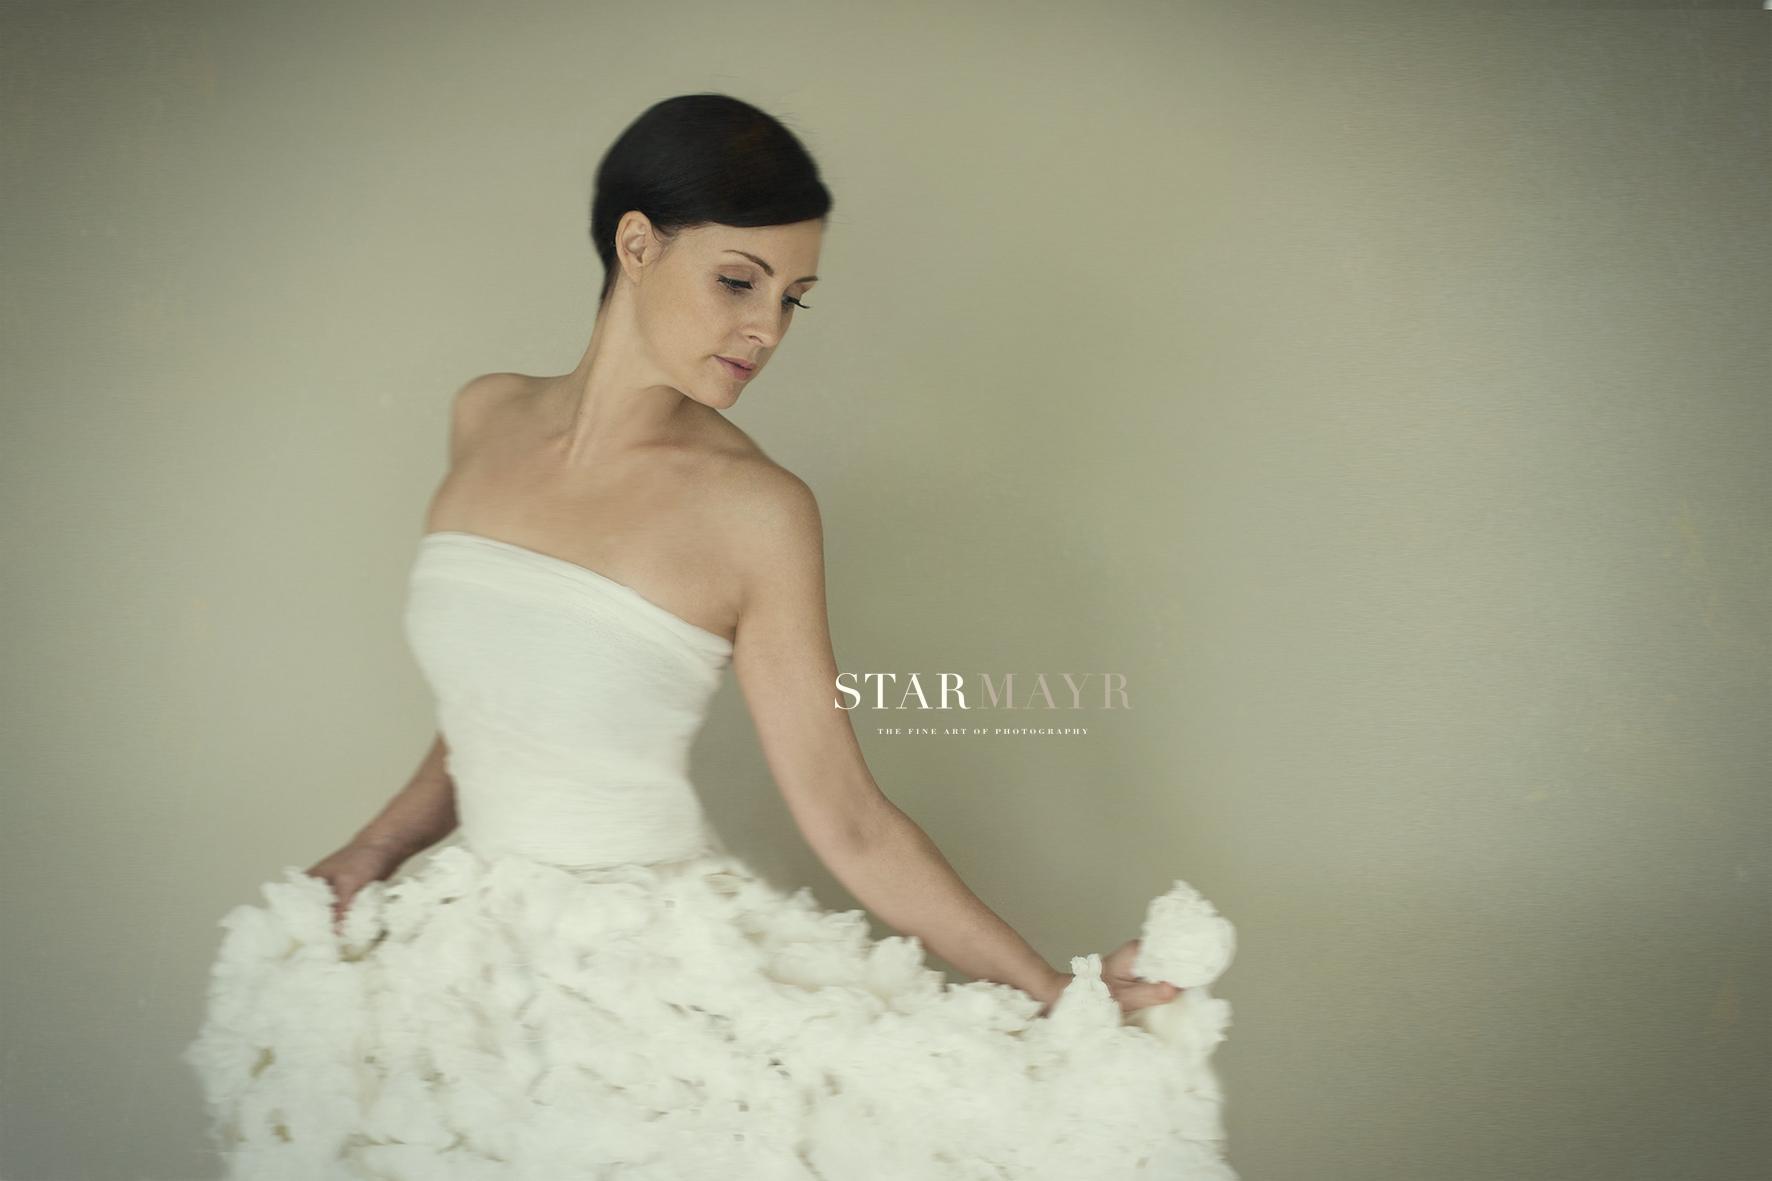 Sabine Starmayr Fotografin, Beautyshooting, Vorher Nachher